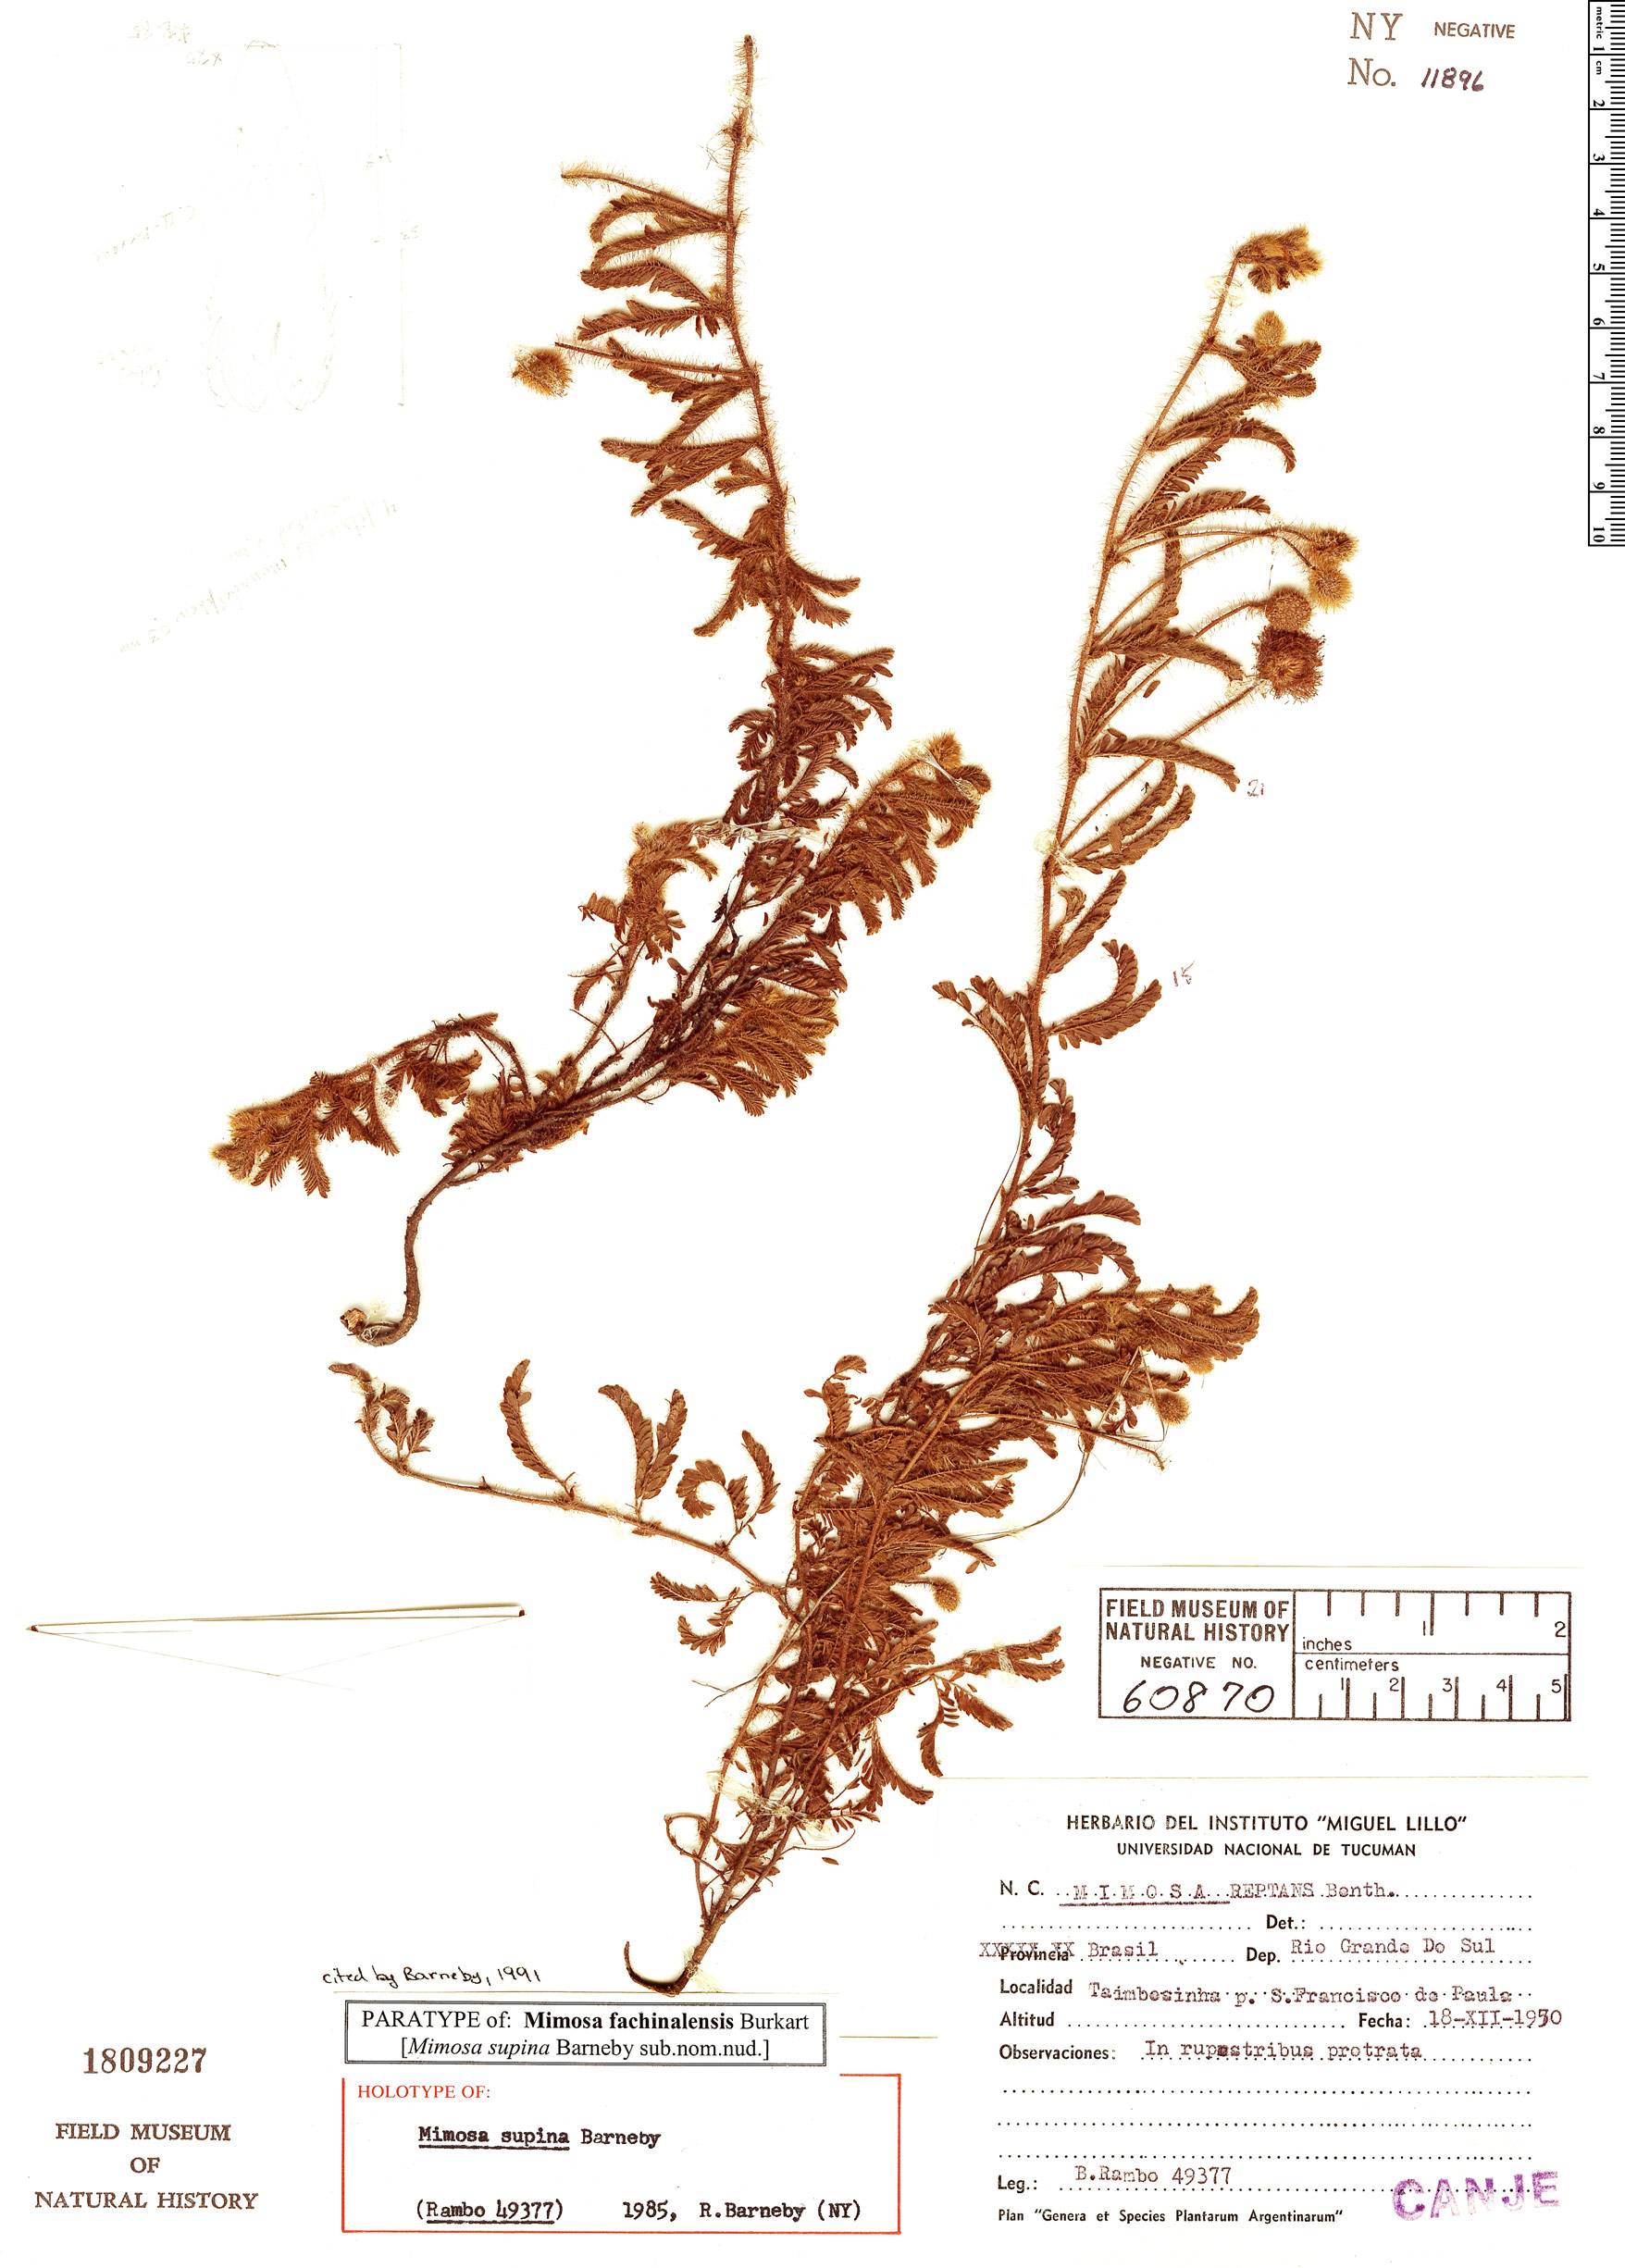 Espécimen: Mimosa fachinalensis